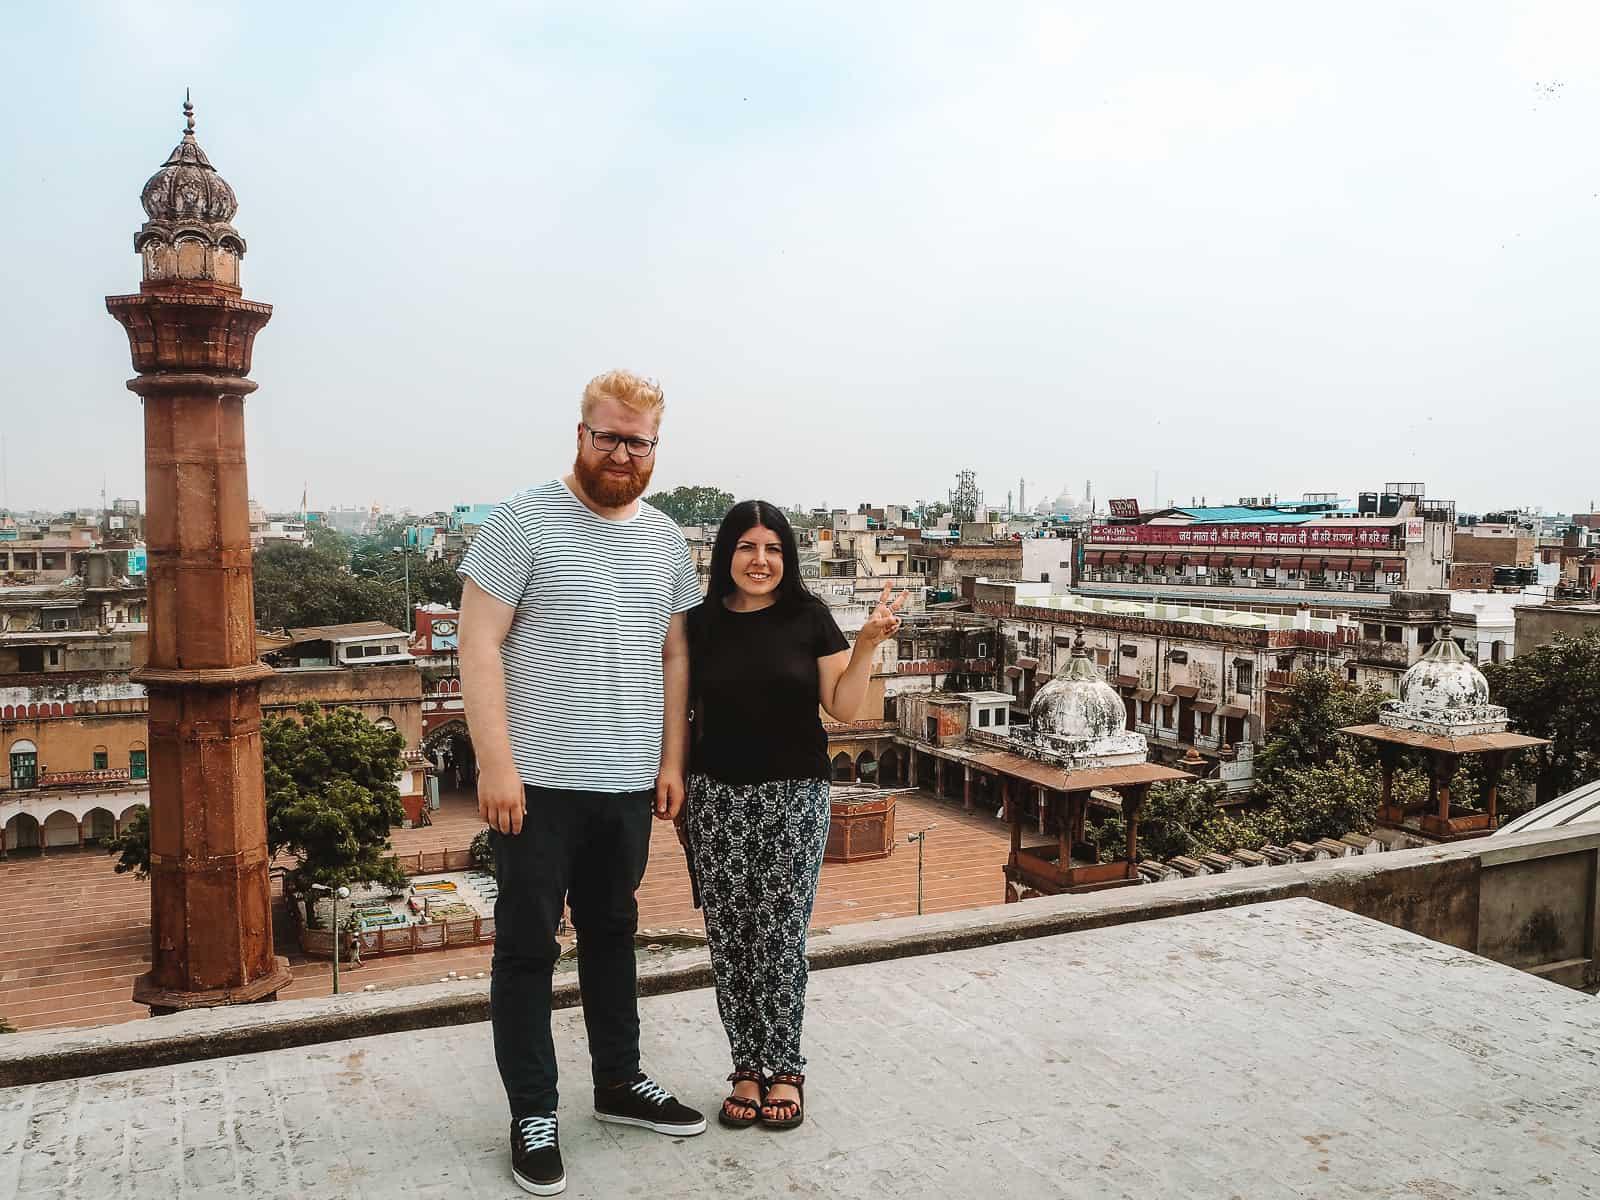 Khari Baoli Old Delhi Spice Market Rooftop